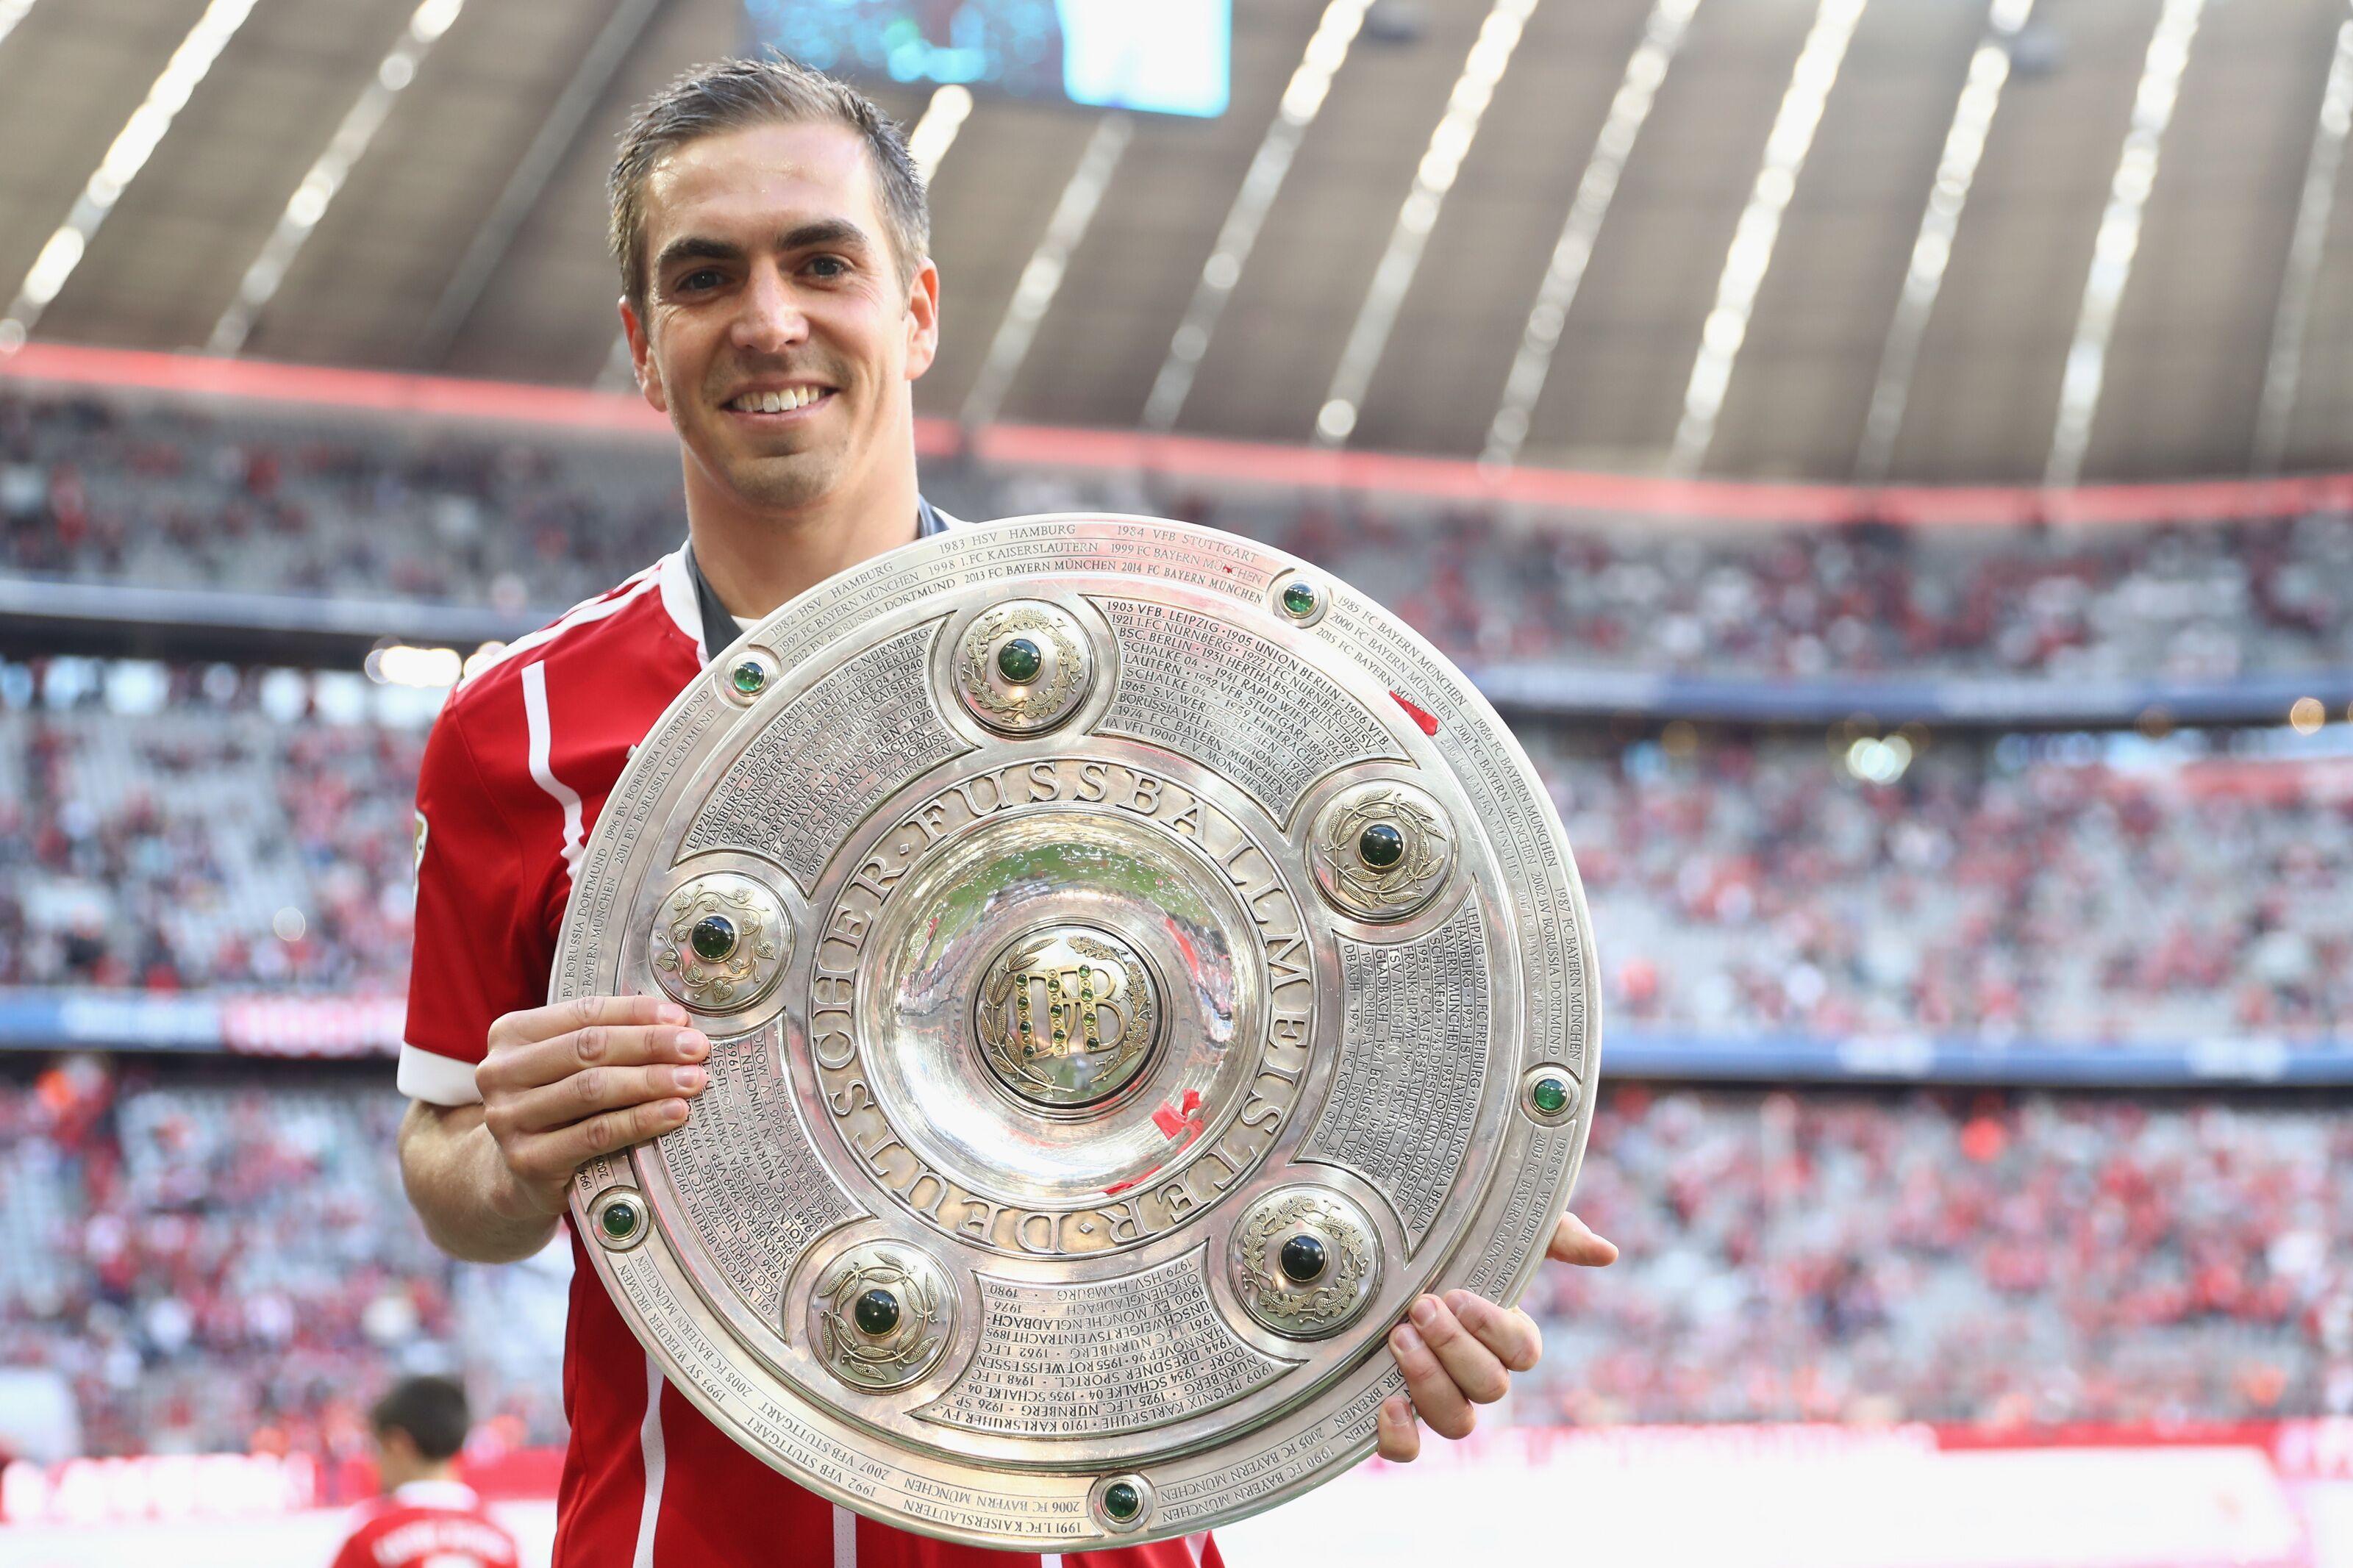 Both Bayern Munich and Germany miss Philipp Lahm's leadership